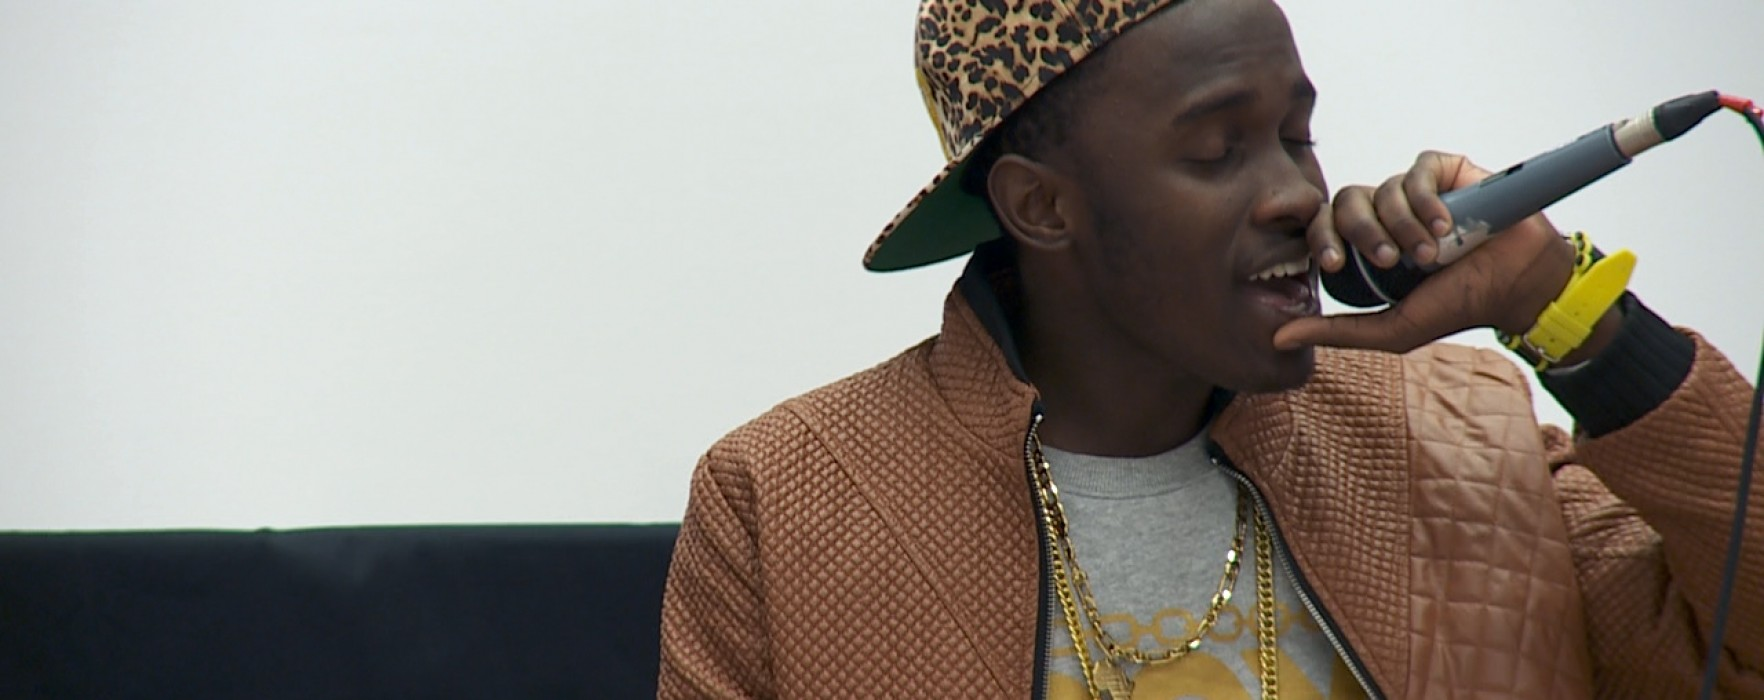 Hiphop-gruppen Destiny spelar på Kristinehamns konstmuseum